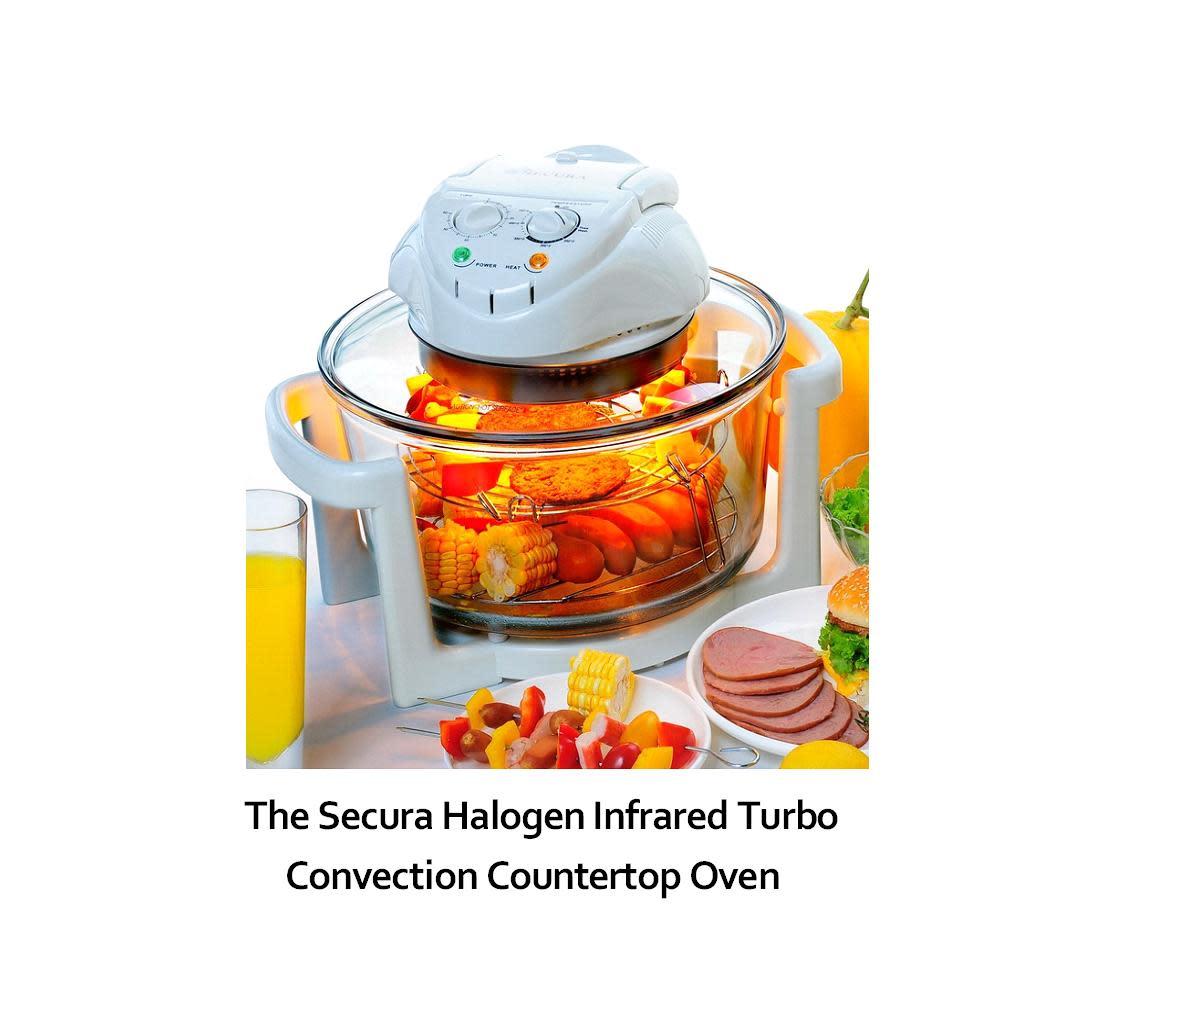 Secura Infrared Countertop Halogen Oven Review